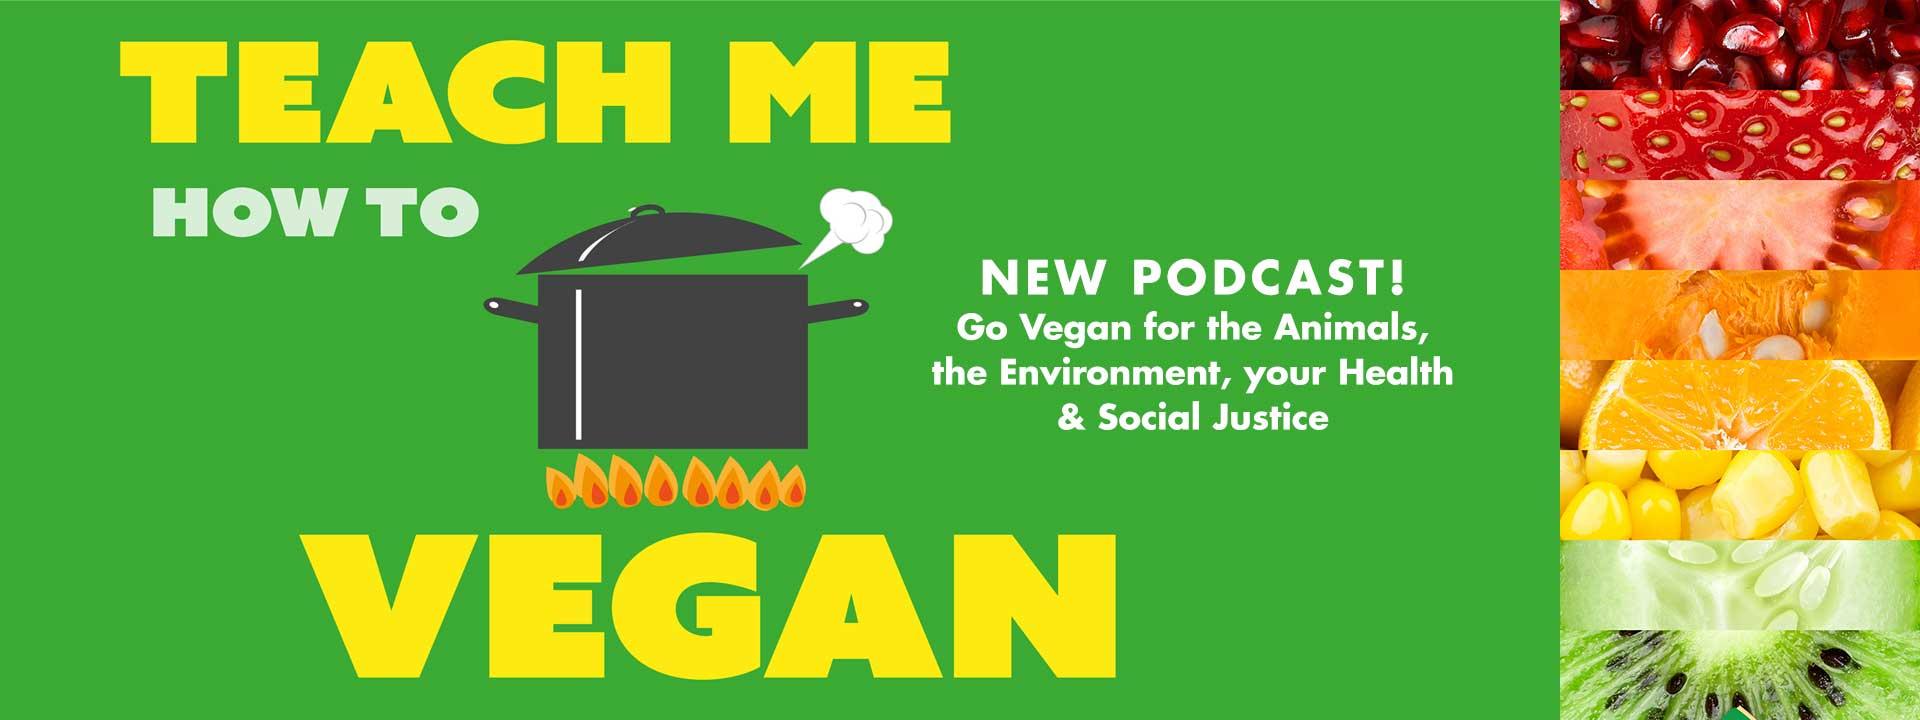 Teach Me How to Vegan Podcast